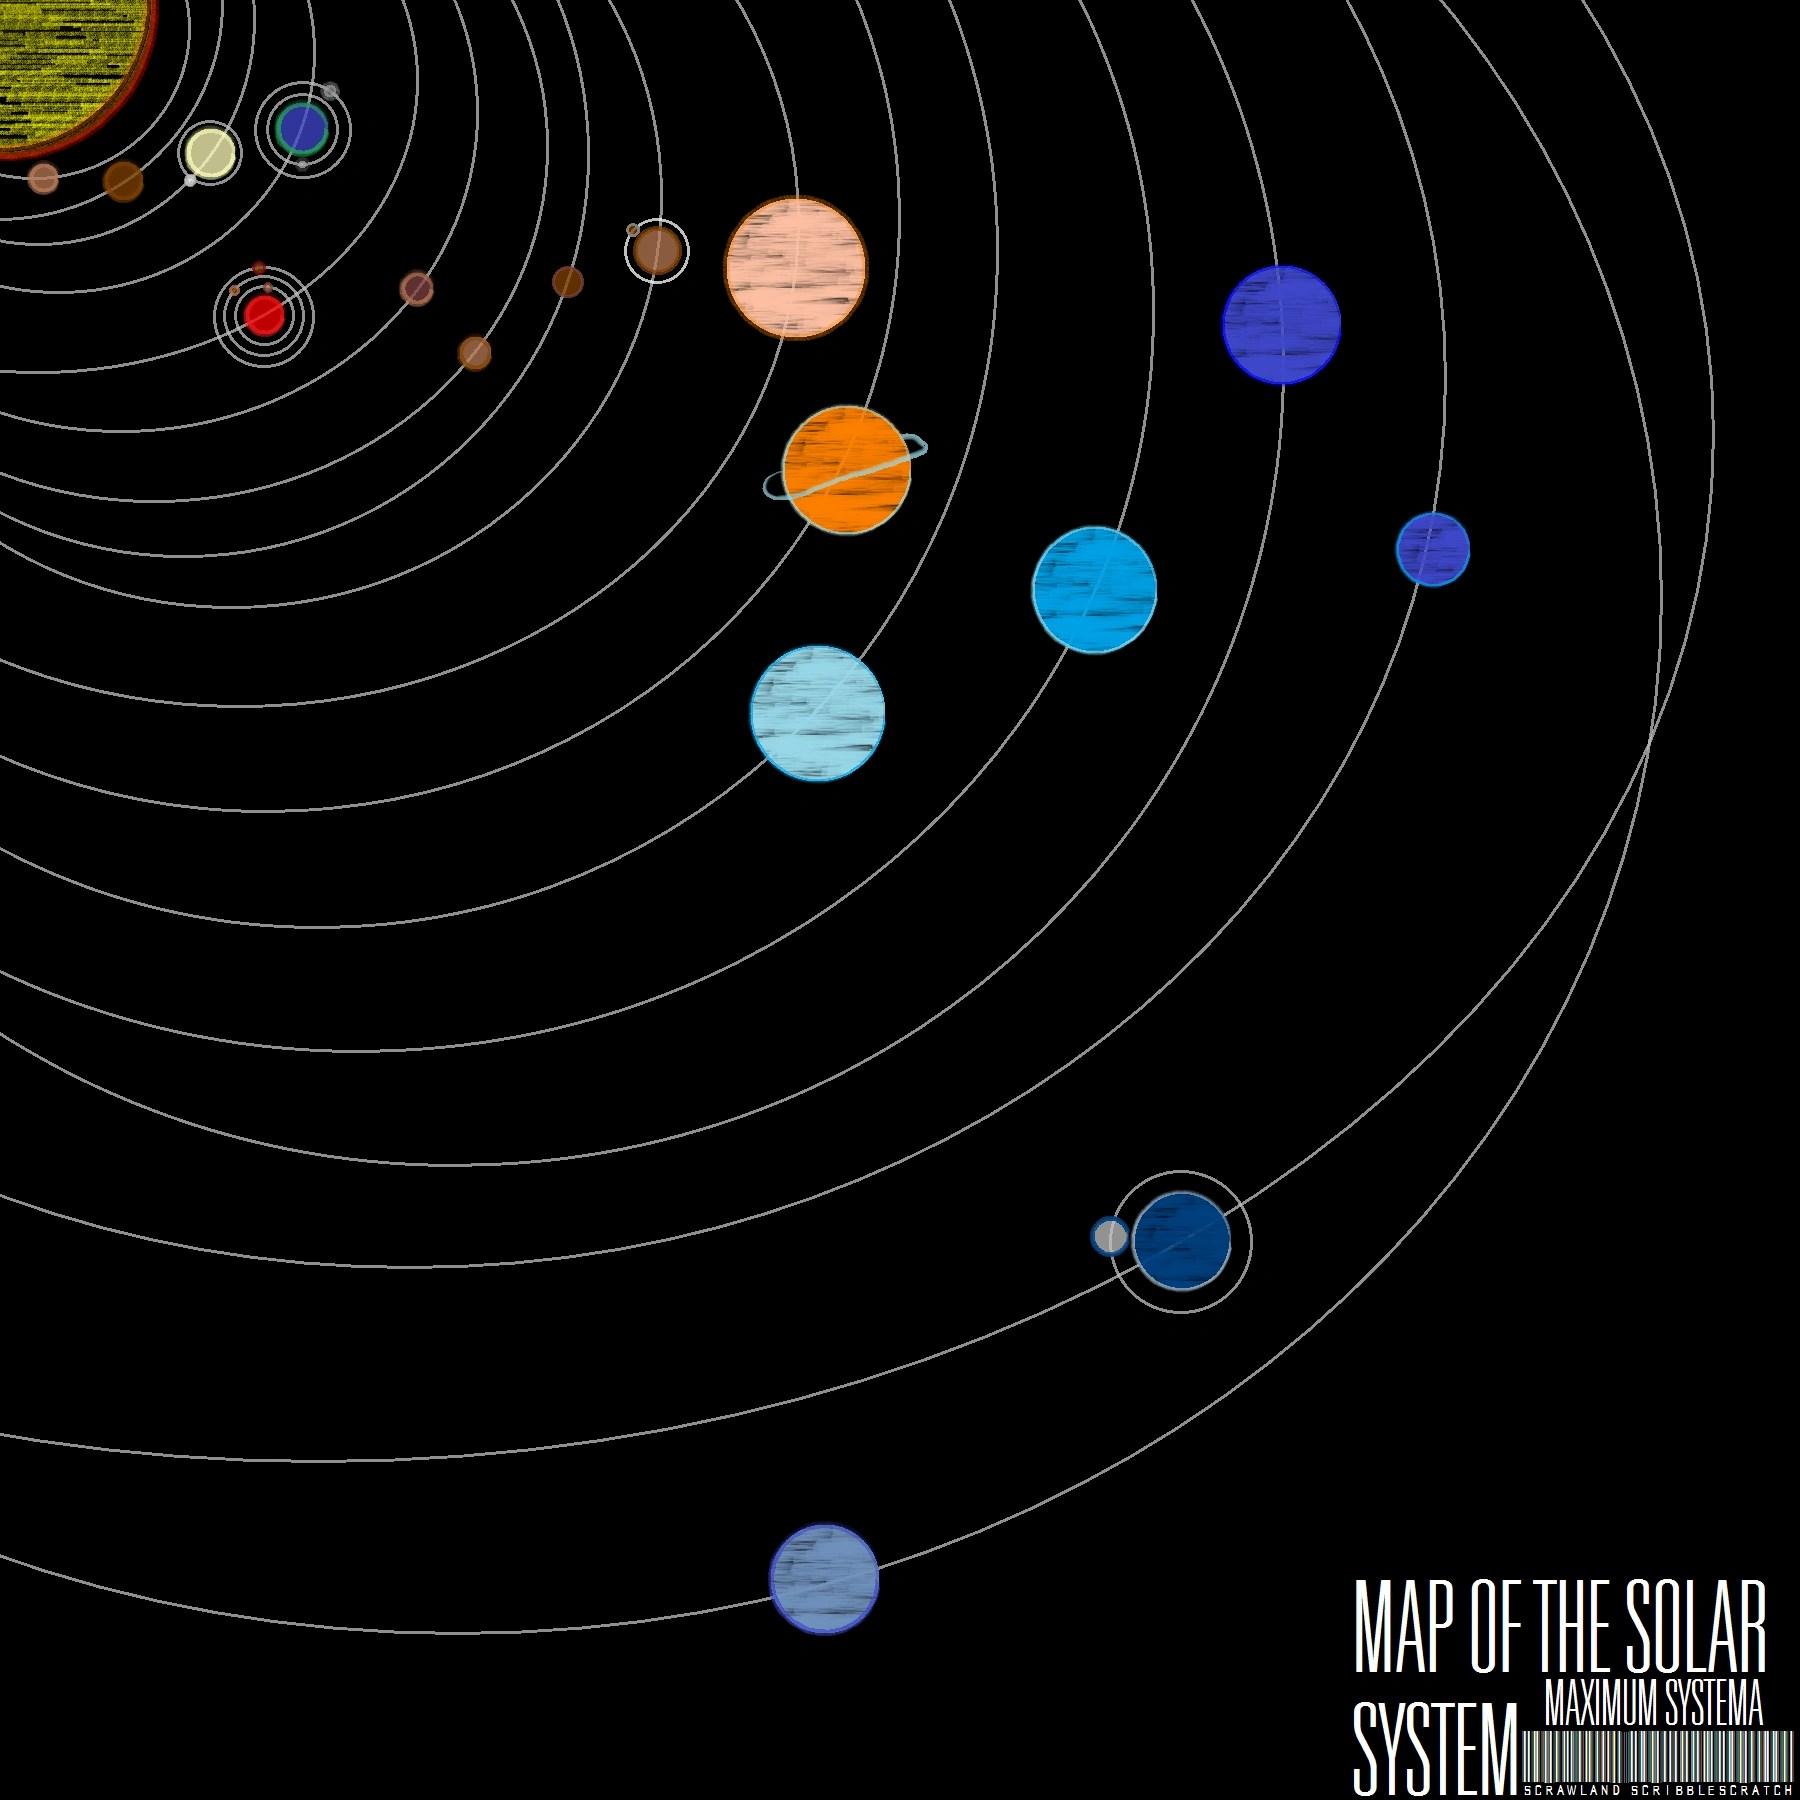 Image MS Solar System Mappng Alternative History